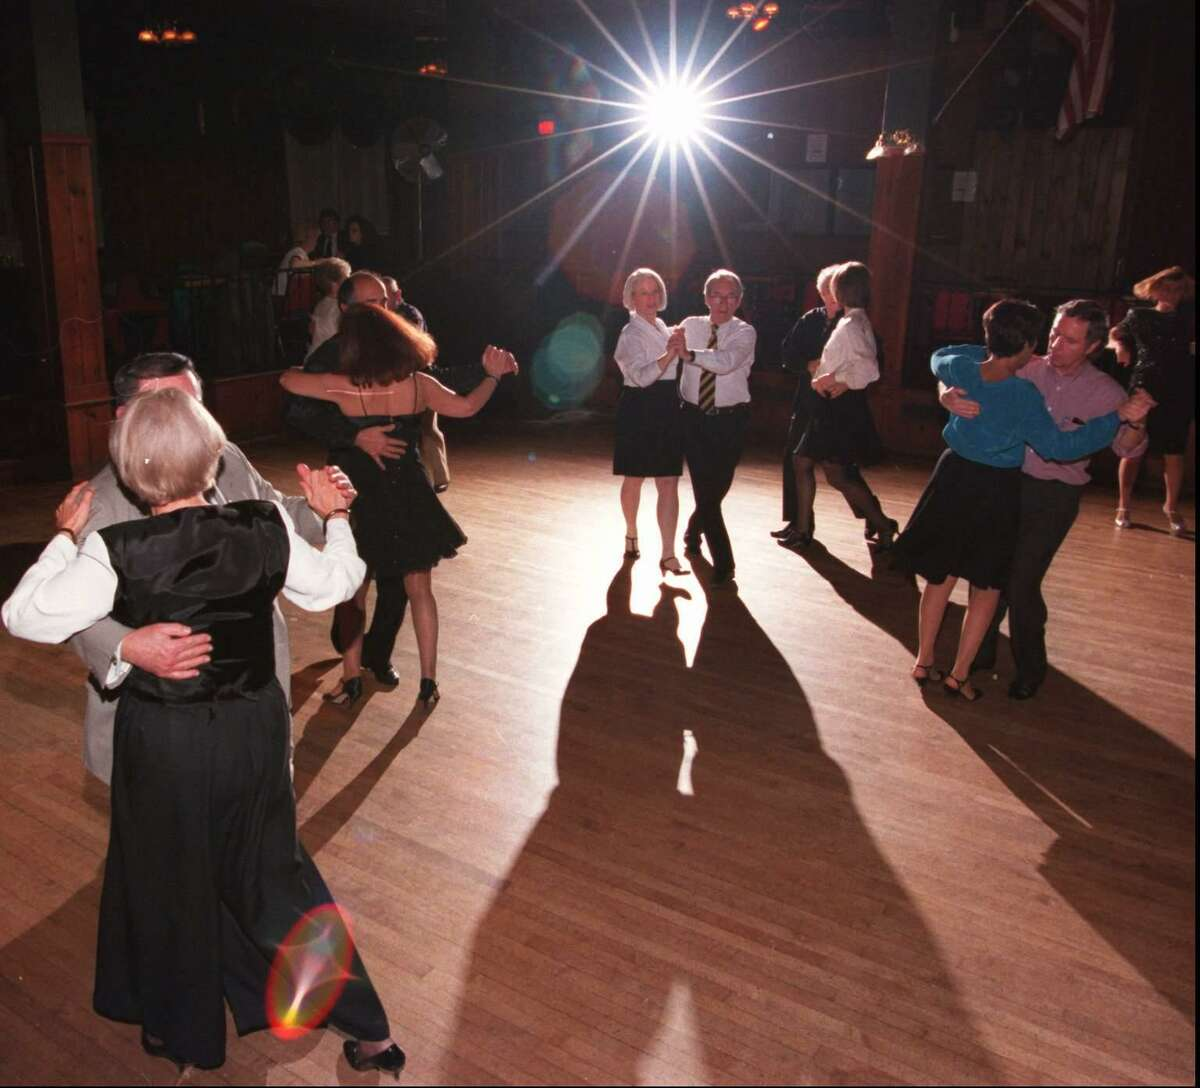 The Terrace Club on West Main St in Stamford holds Ballroom dancing on Wednesdays. Nov 20, 96 Tom Ryan/Staff Photo